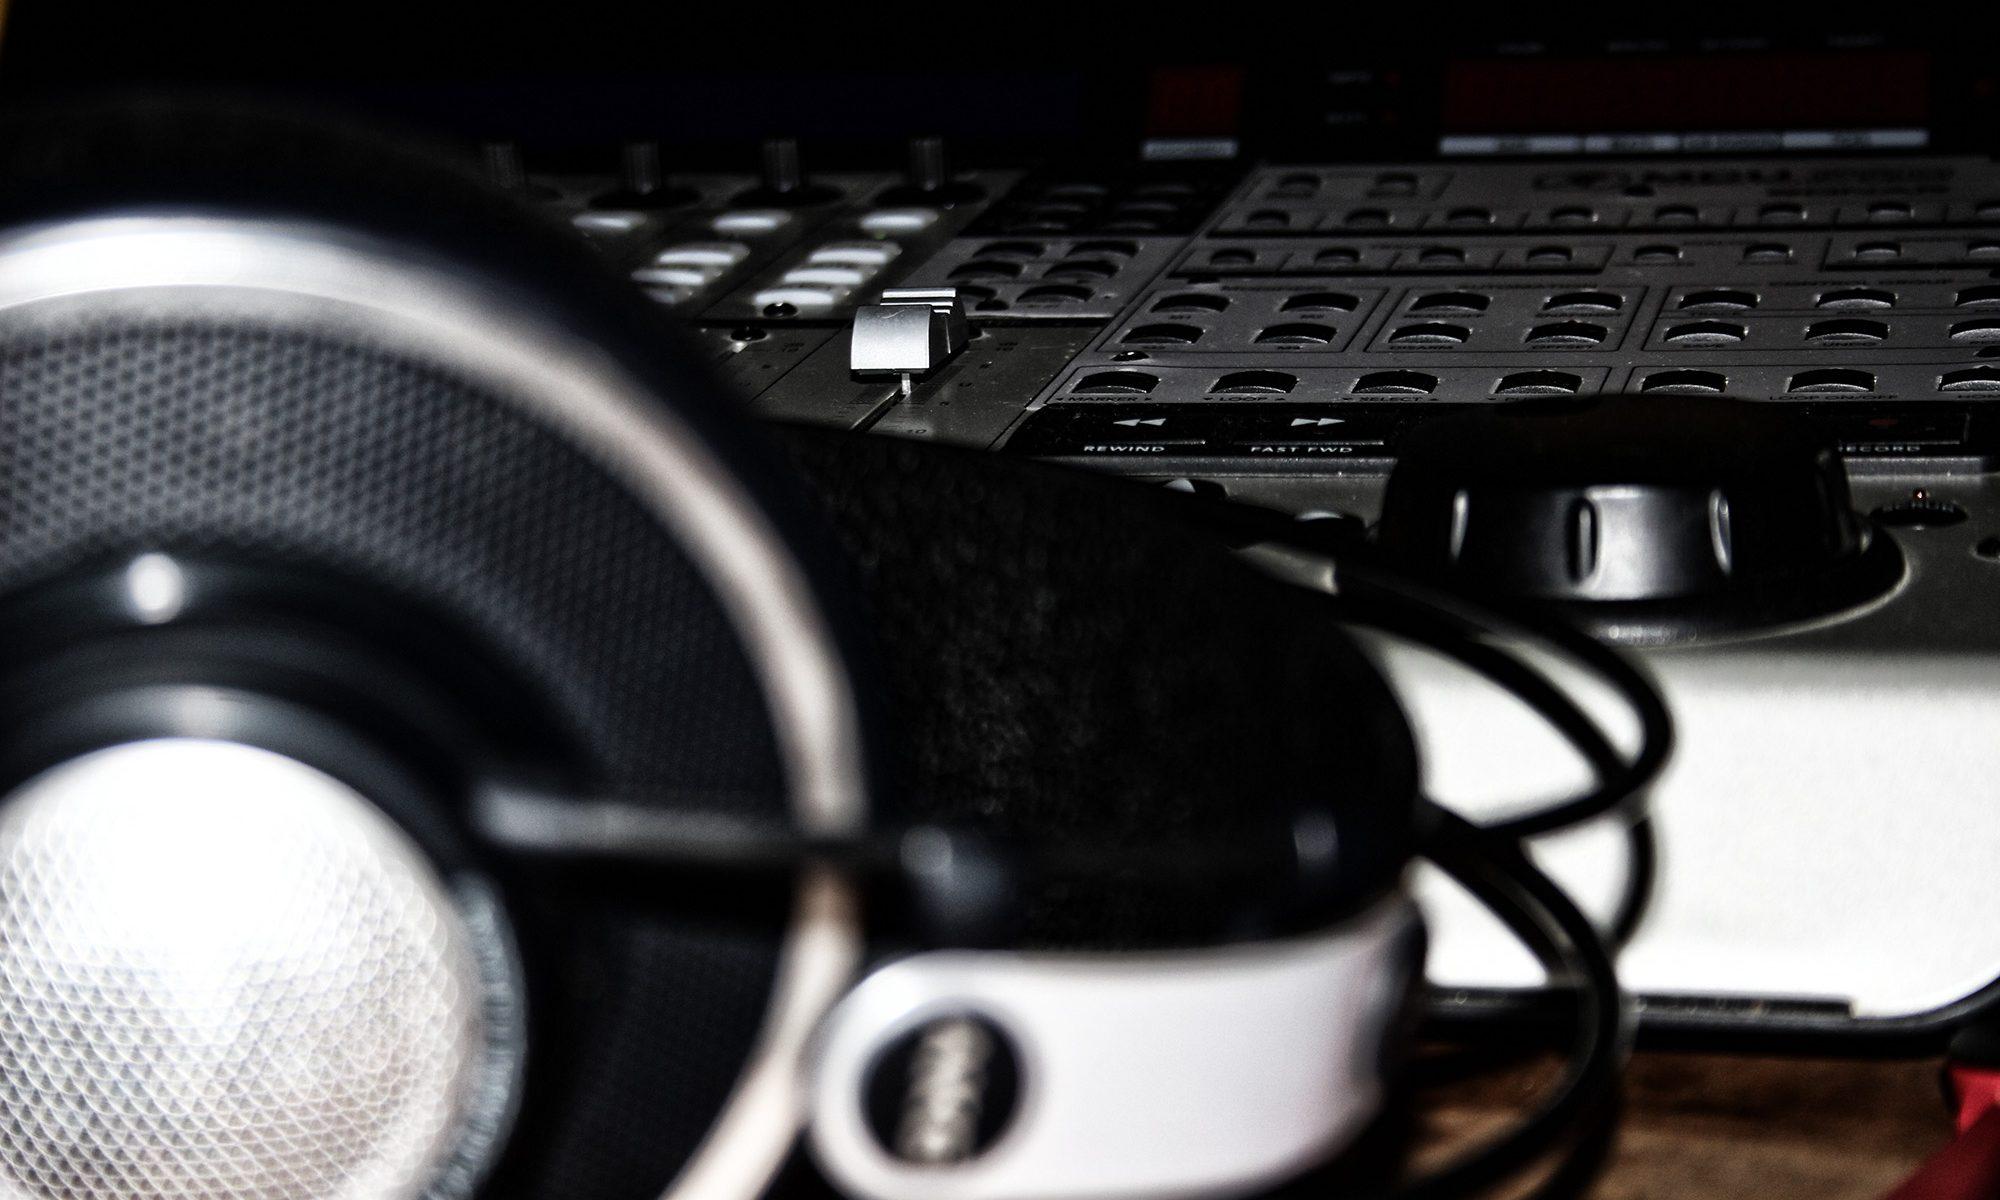 AKG Headphones und Makie Mixingkonsole